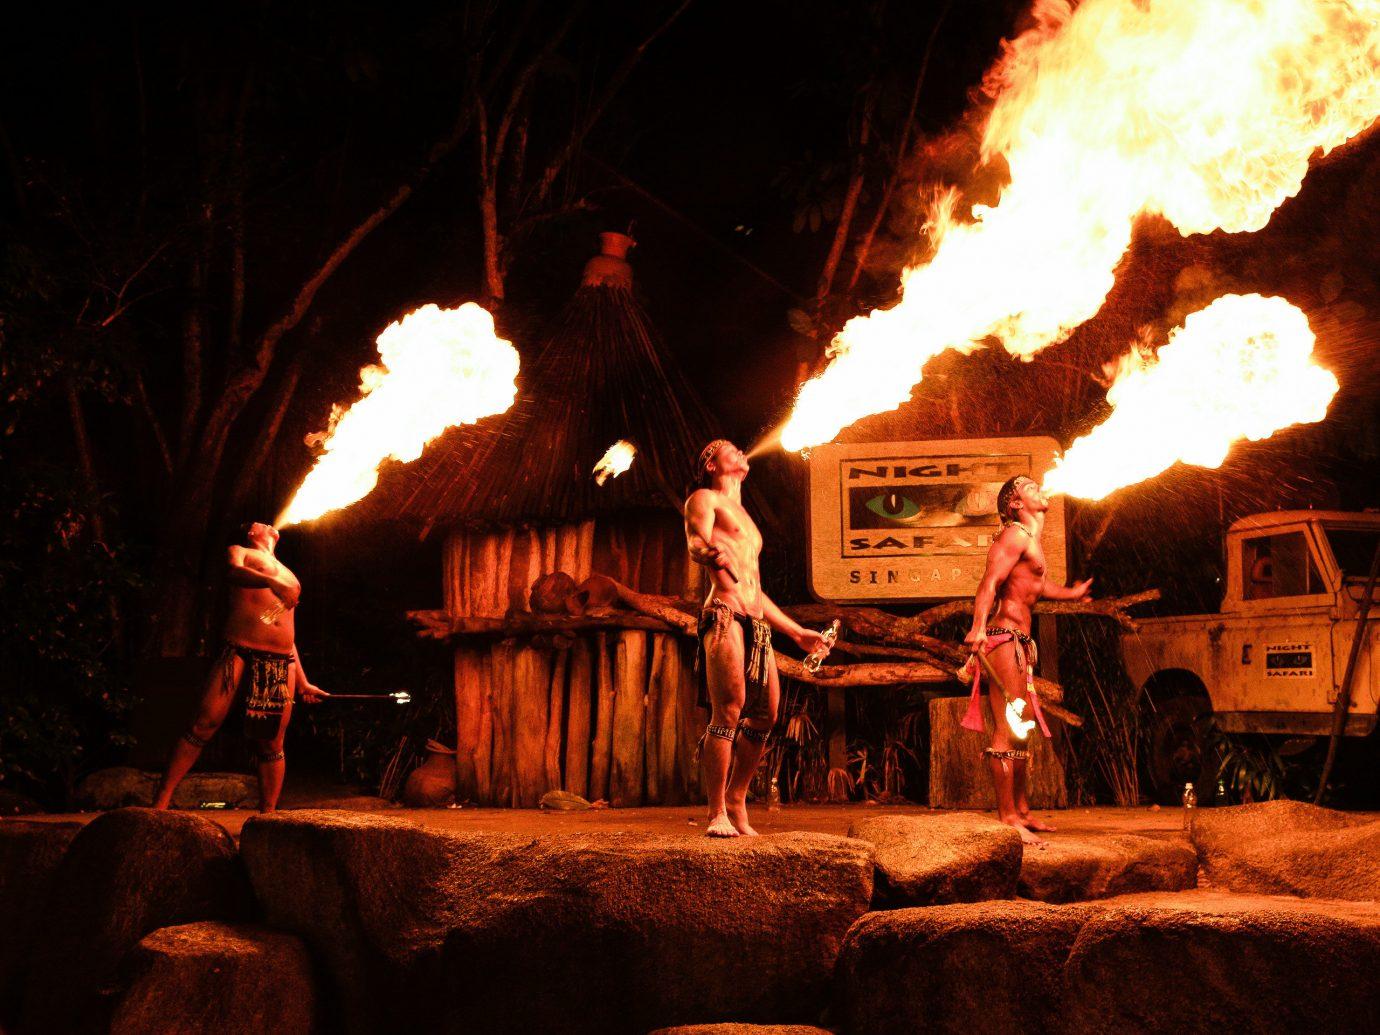 Arts + Culture Singapore Southeast Asia Trip Ideas Nature fire smoke outdoor flame light night campfire Entertainment heat bonfire darkness tradition performance art recreation dark fun fête performing arts engine